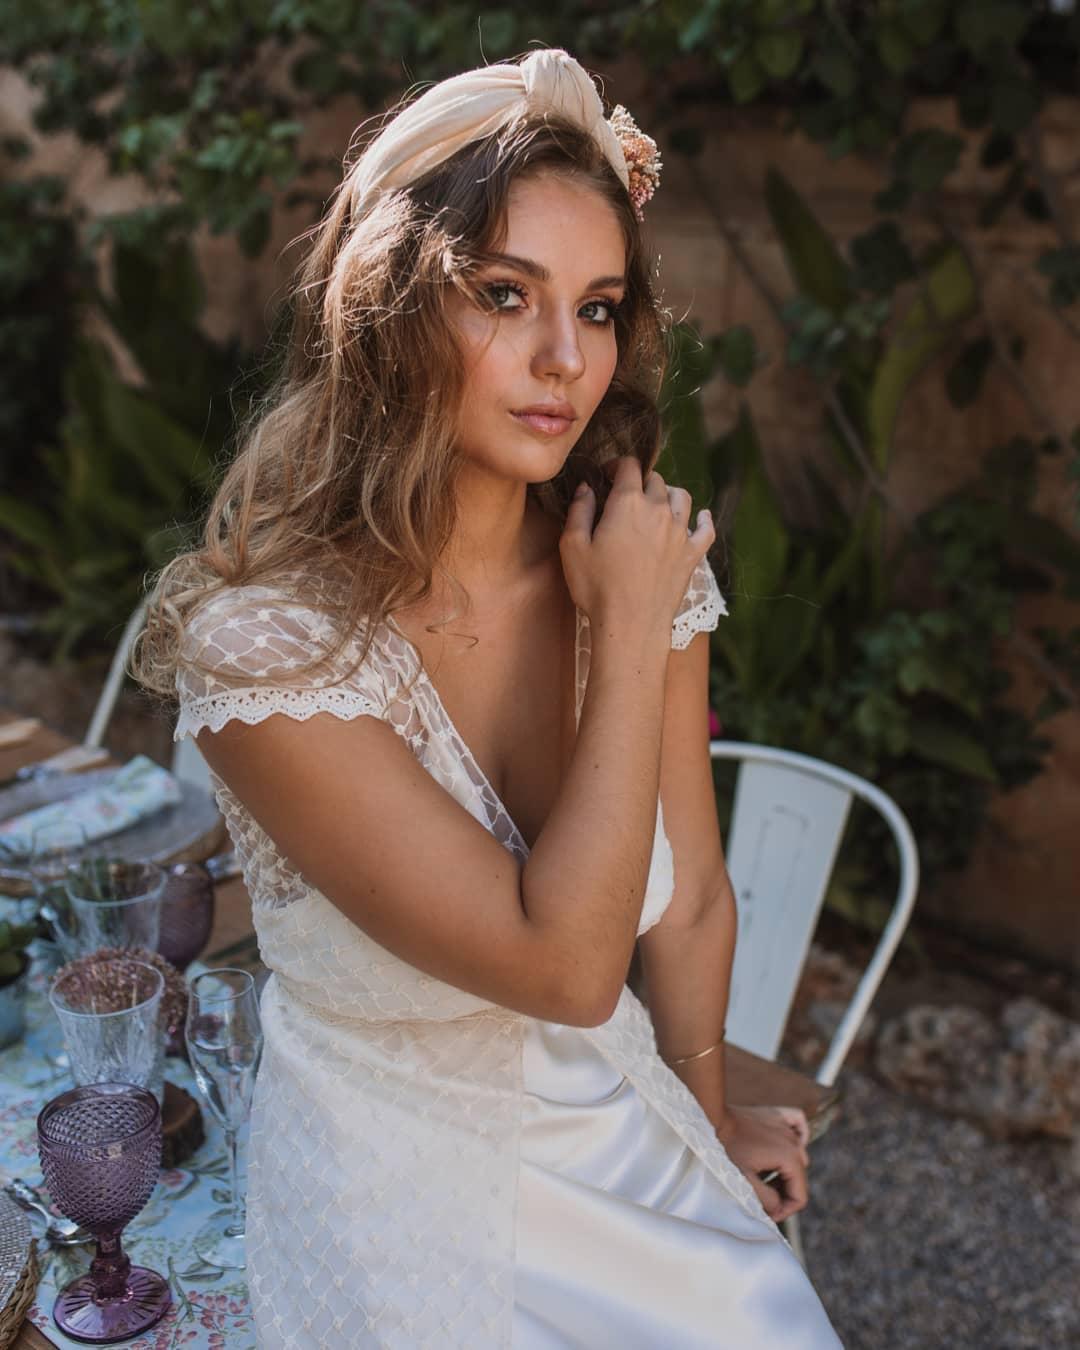 claudia cruz garcia gonzalez, miss international spain 2019. 69932910